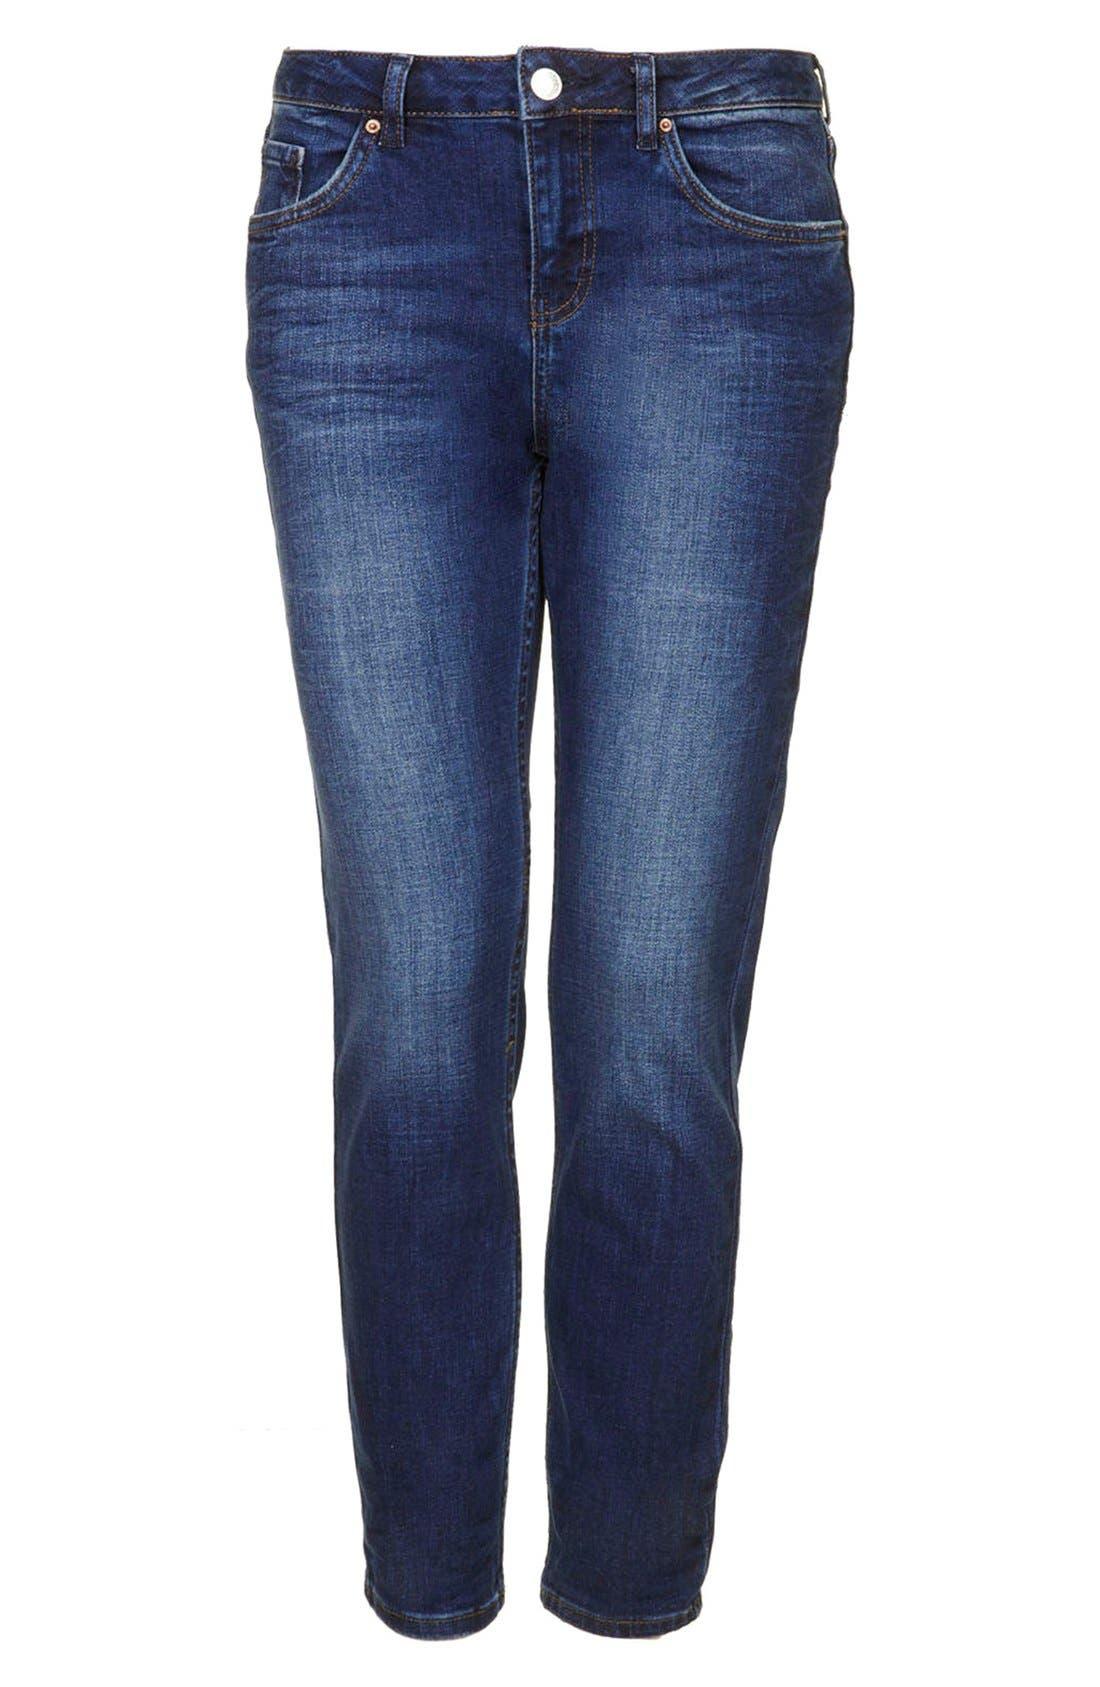 Alternate Image 3  - Topshop Moto Relaxed Straight Leg Jeans (Blue)